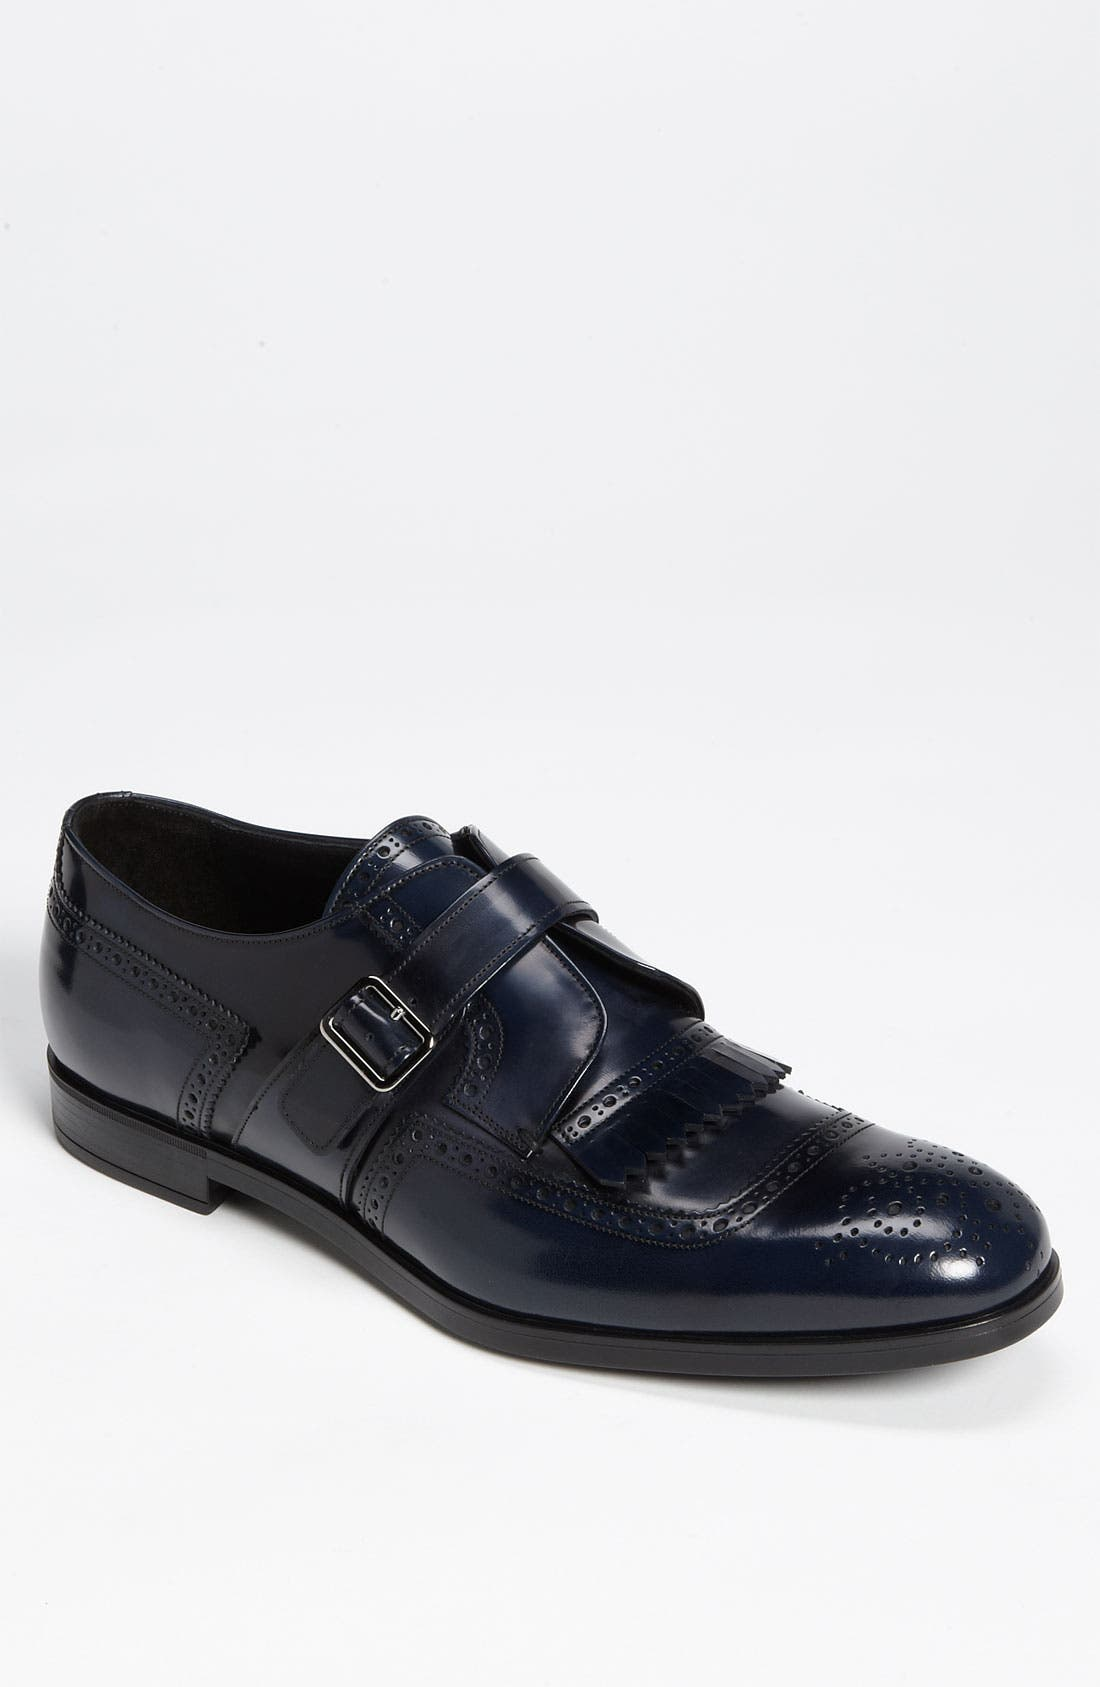 Alternate Image 1 Selected - Prada Brogue Kiltie Monk Strap Shoe